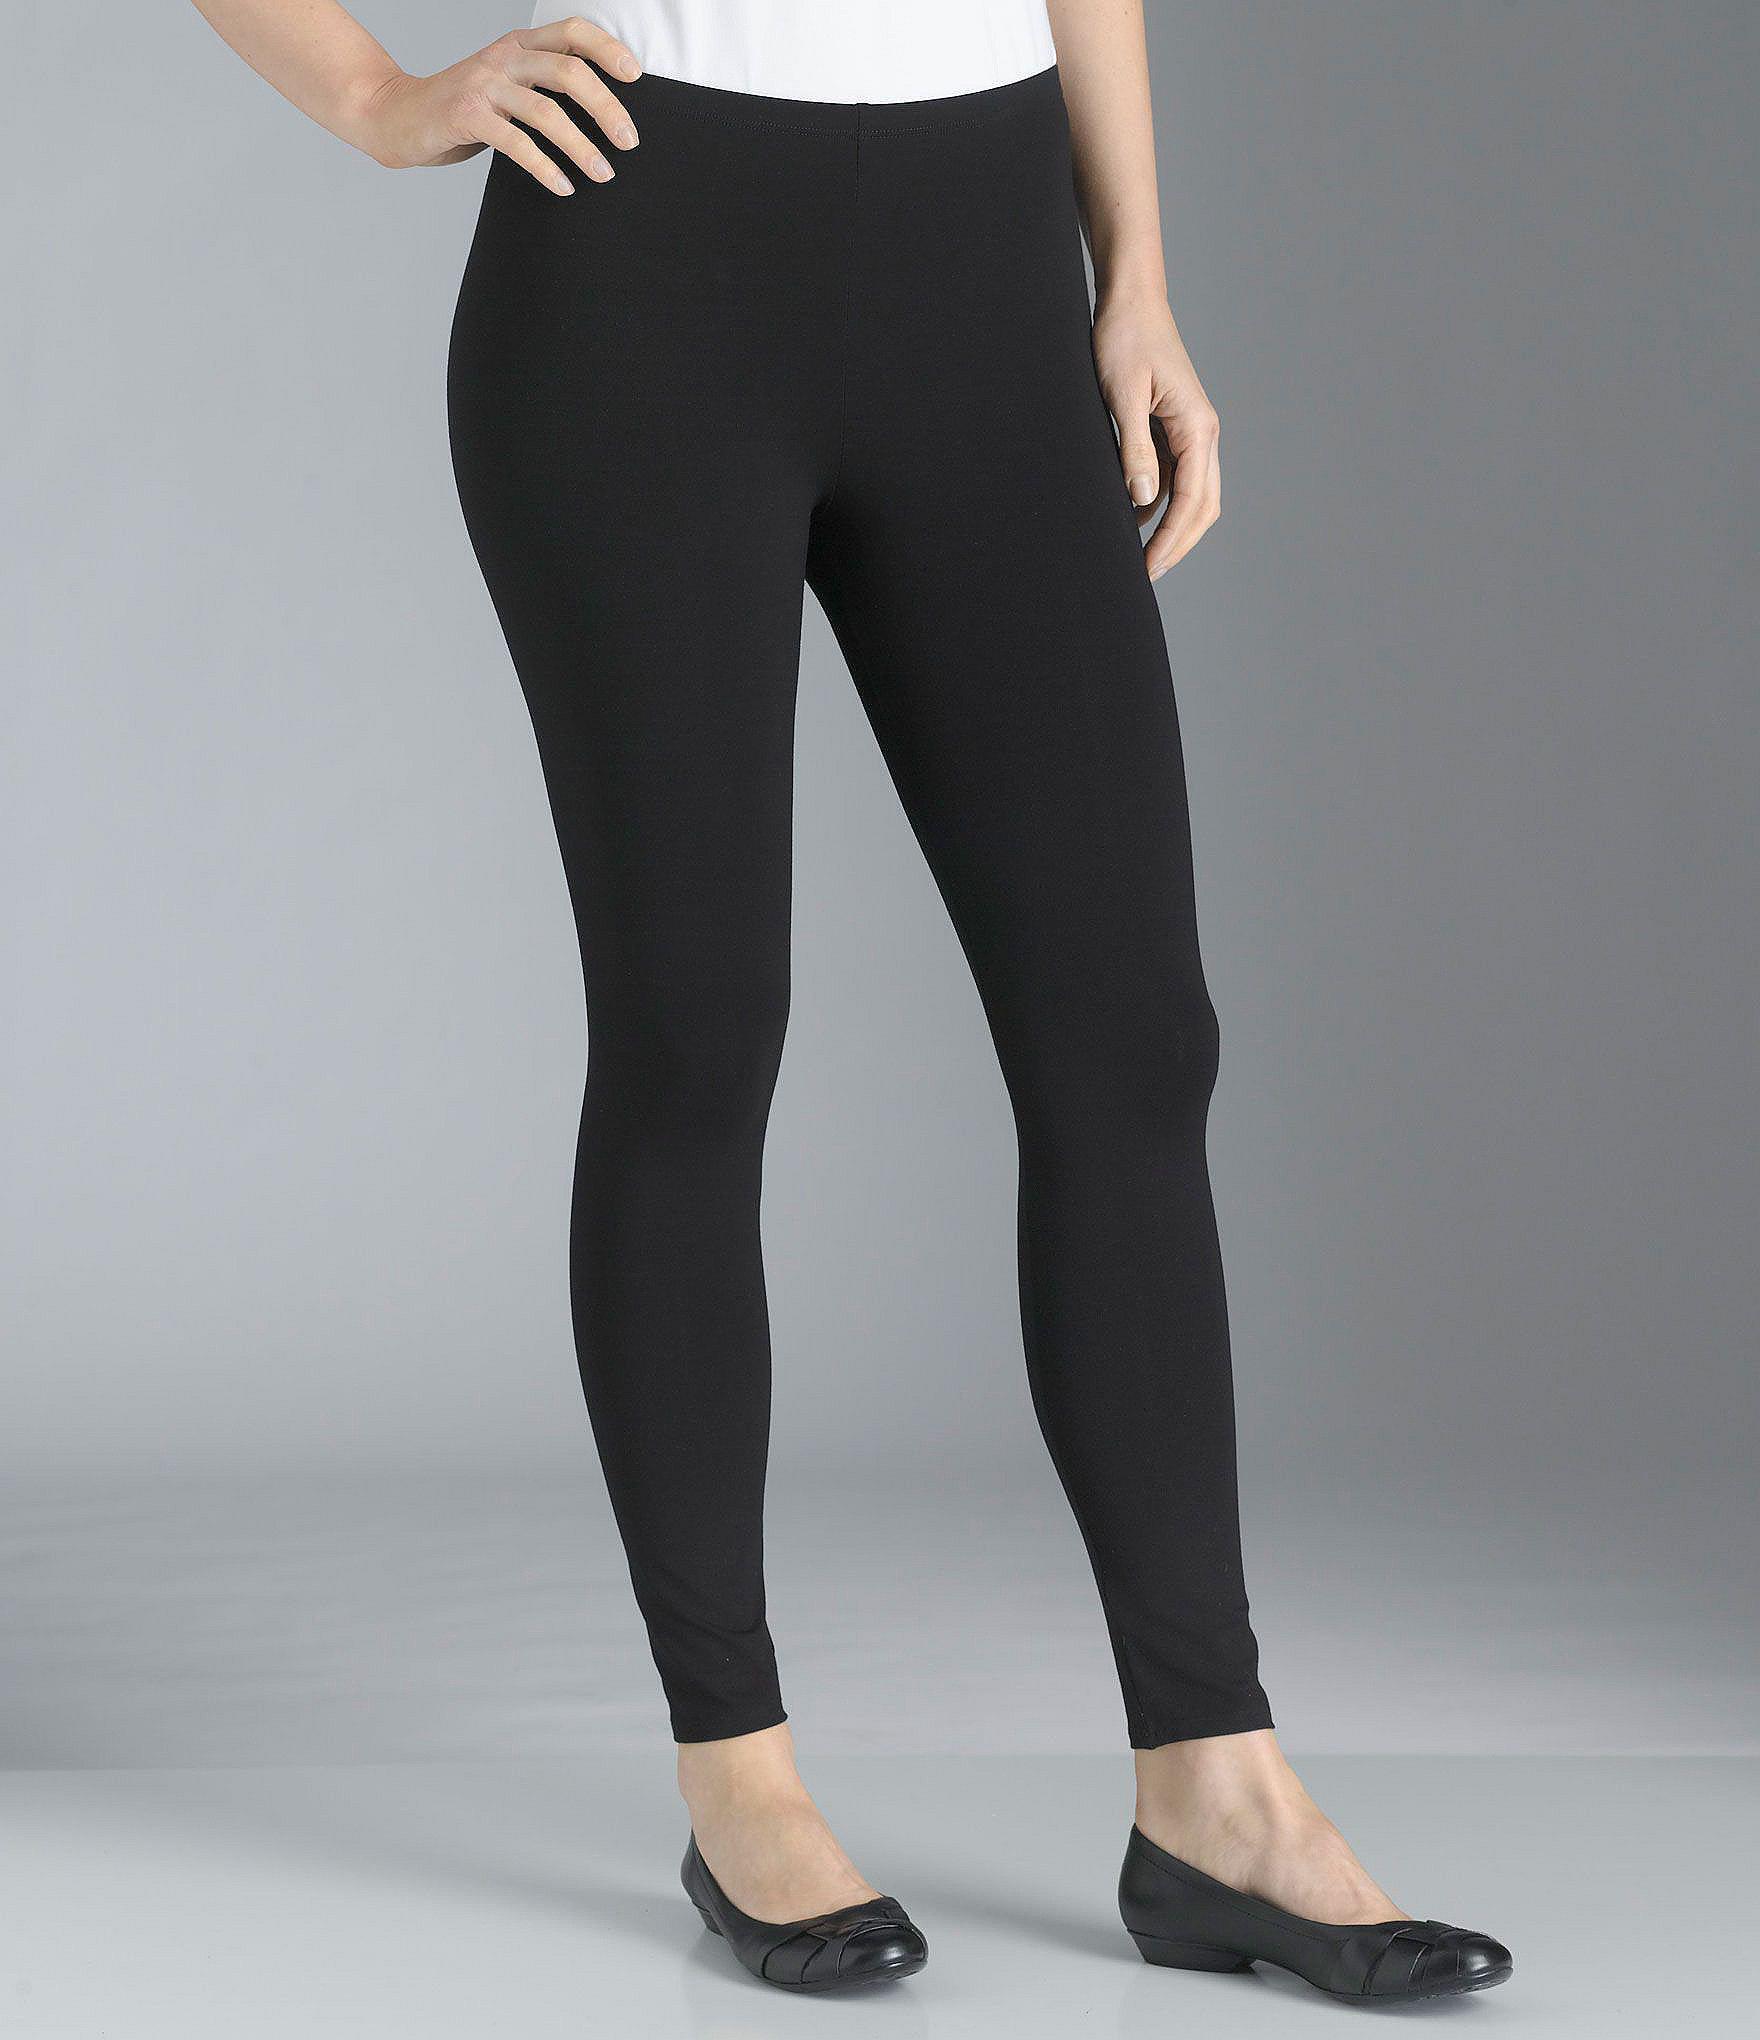 939a5836c4d3b Eileen Fisher. Women's Black Petite Essentials Jersey Ankle Leggings